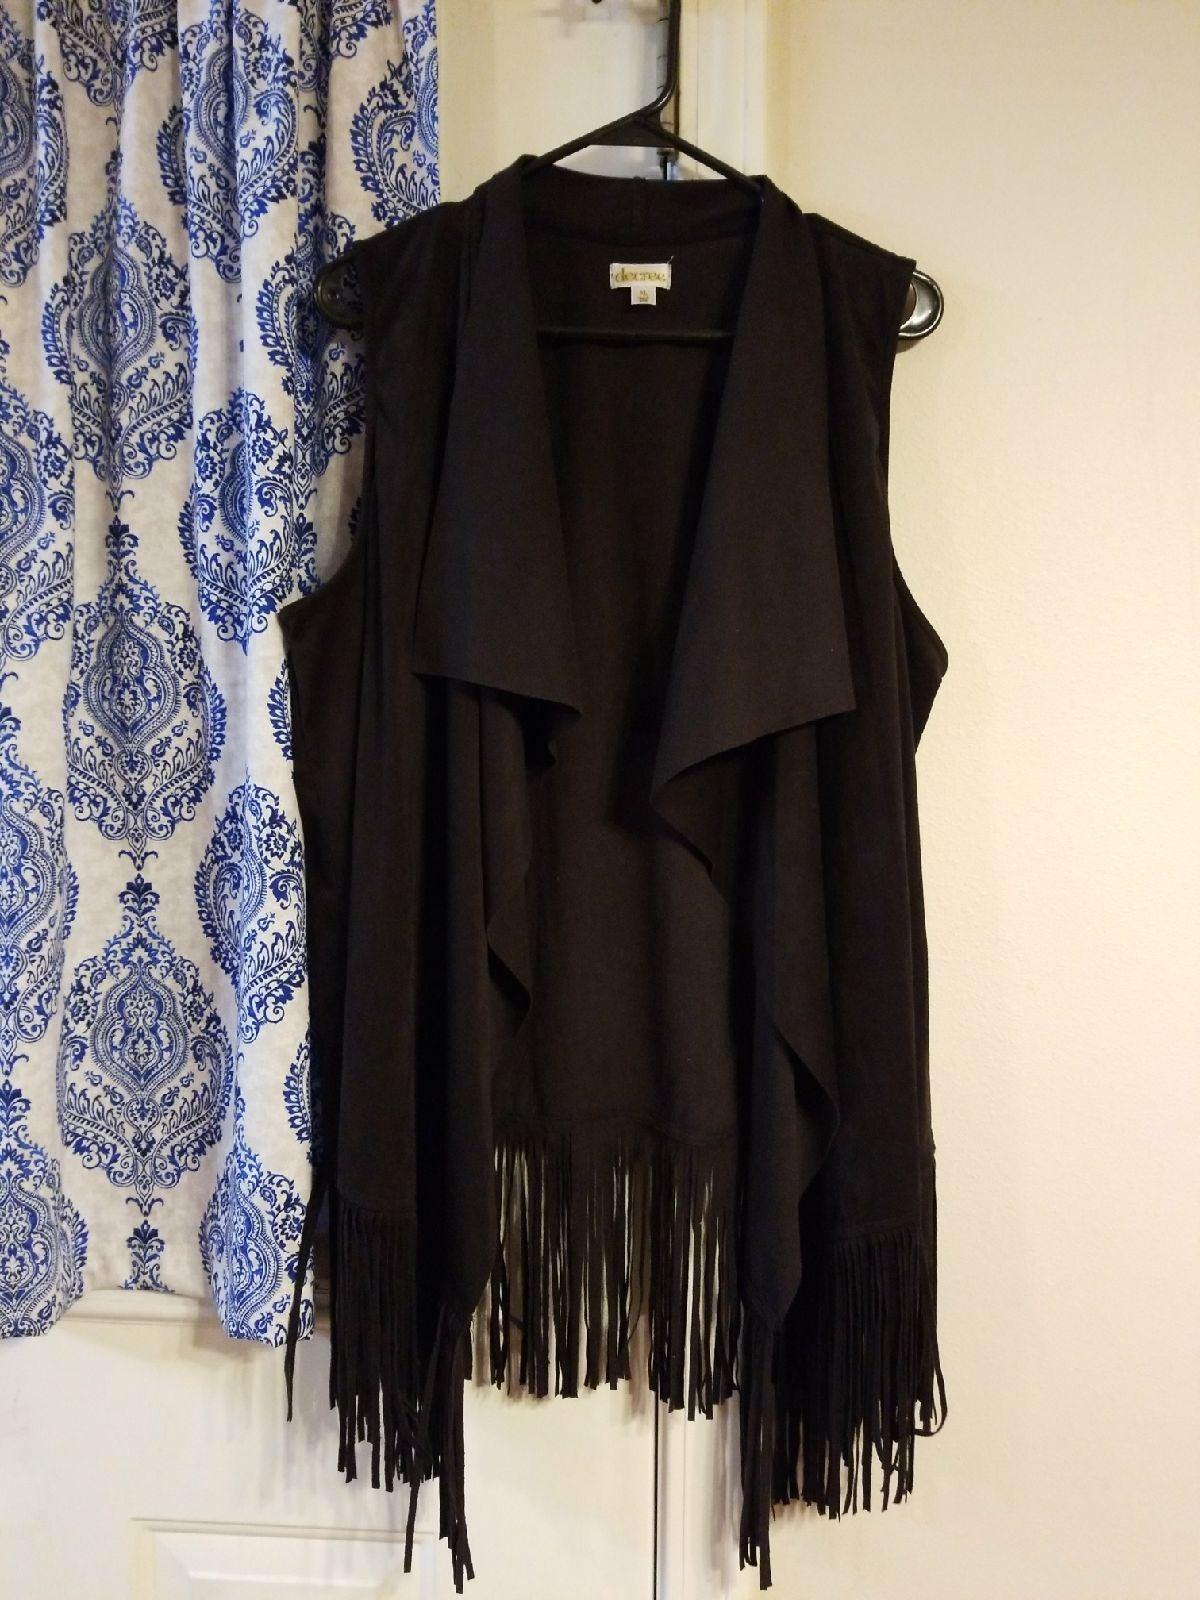 Fringe vest XL